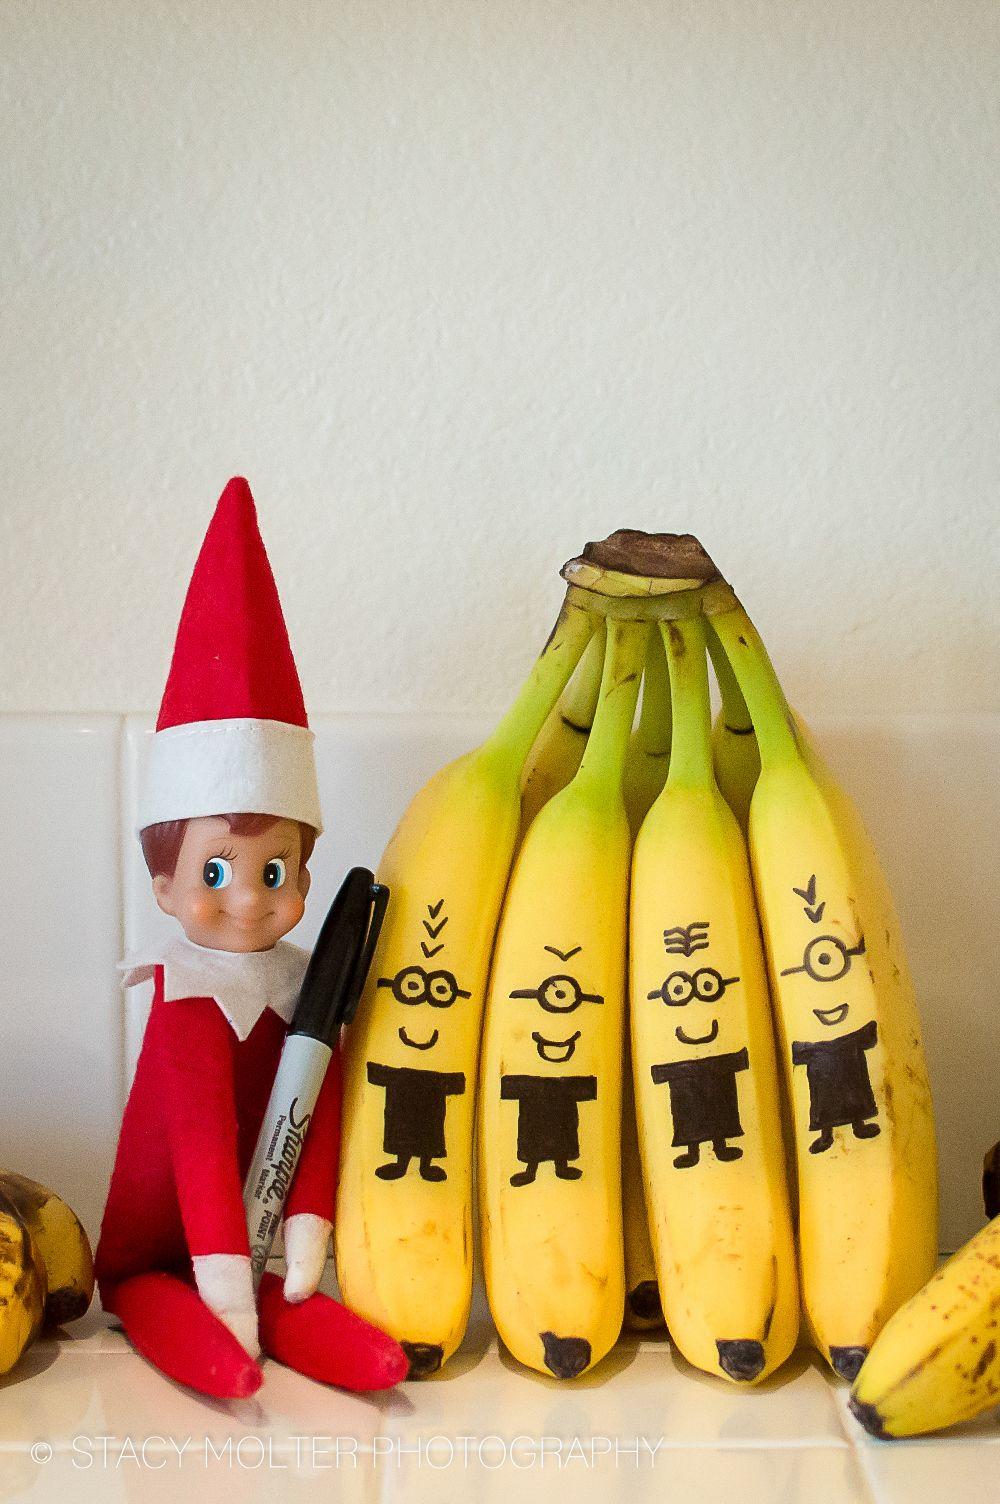 Top 50 elf on the shelf ideas i heart nap time - Elf On The Shelf Ideas For Christmas